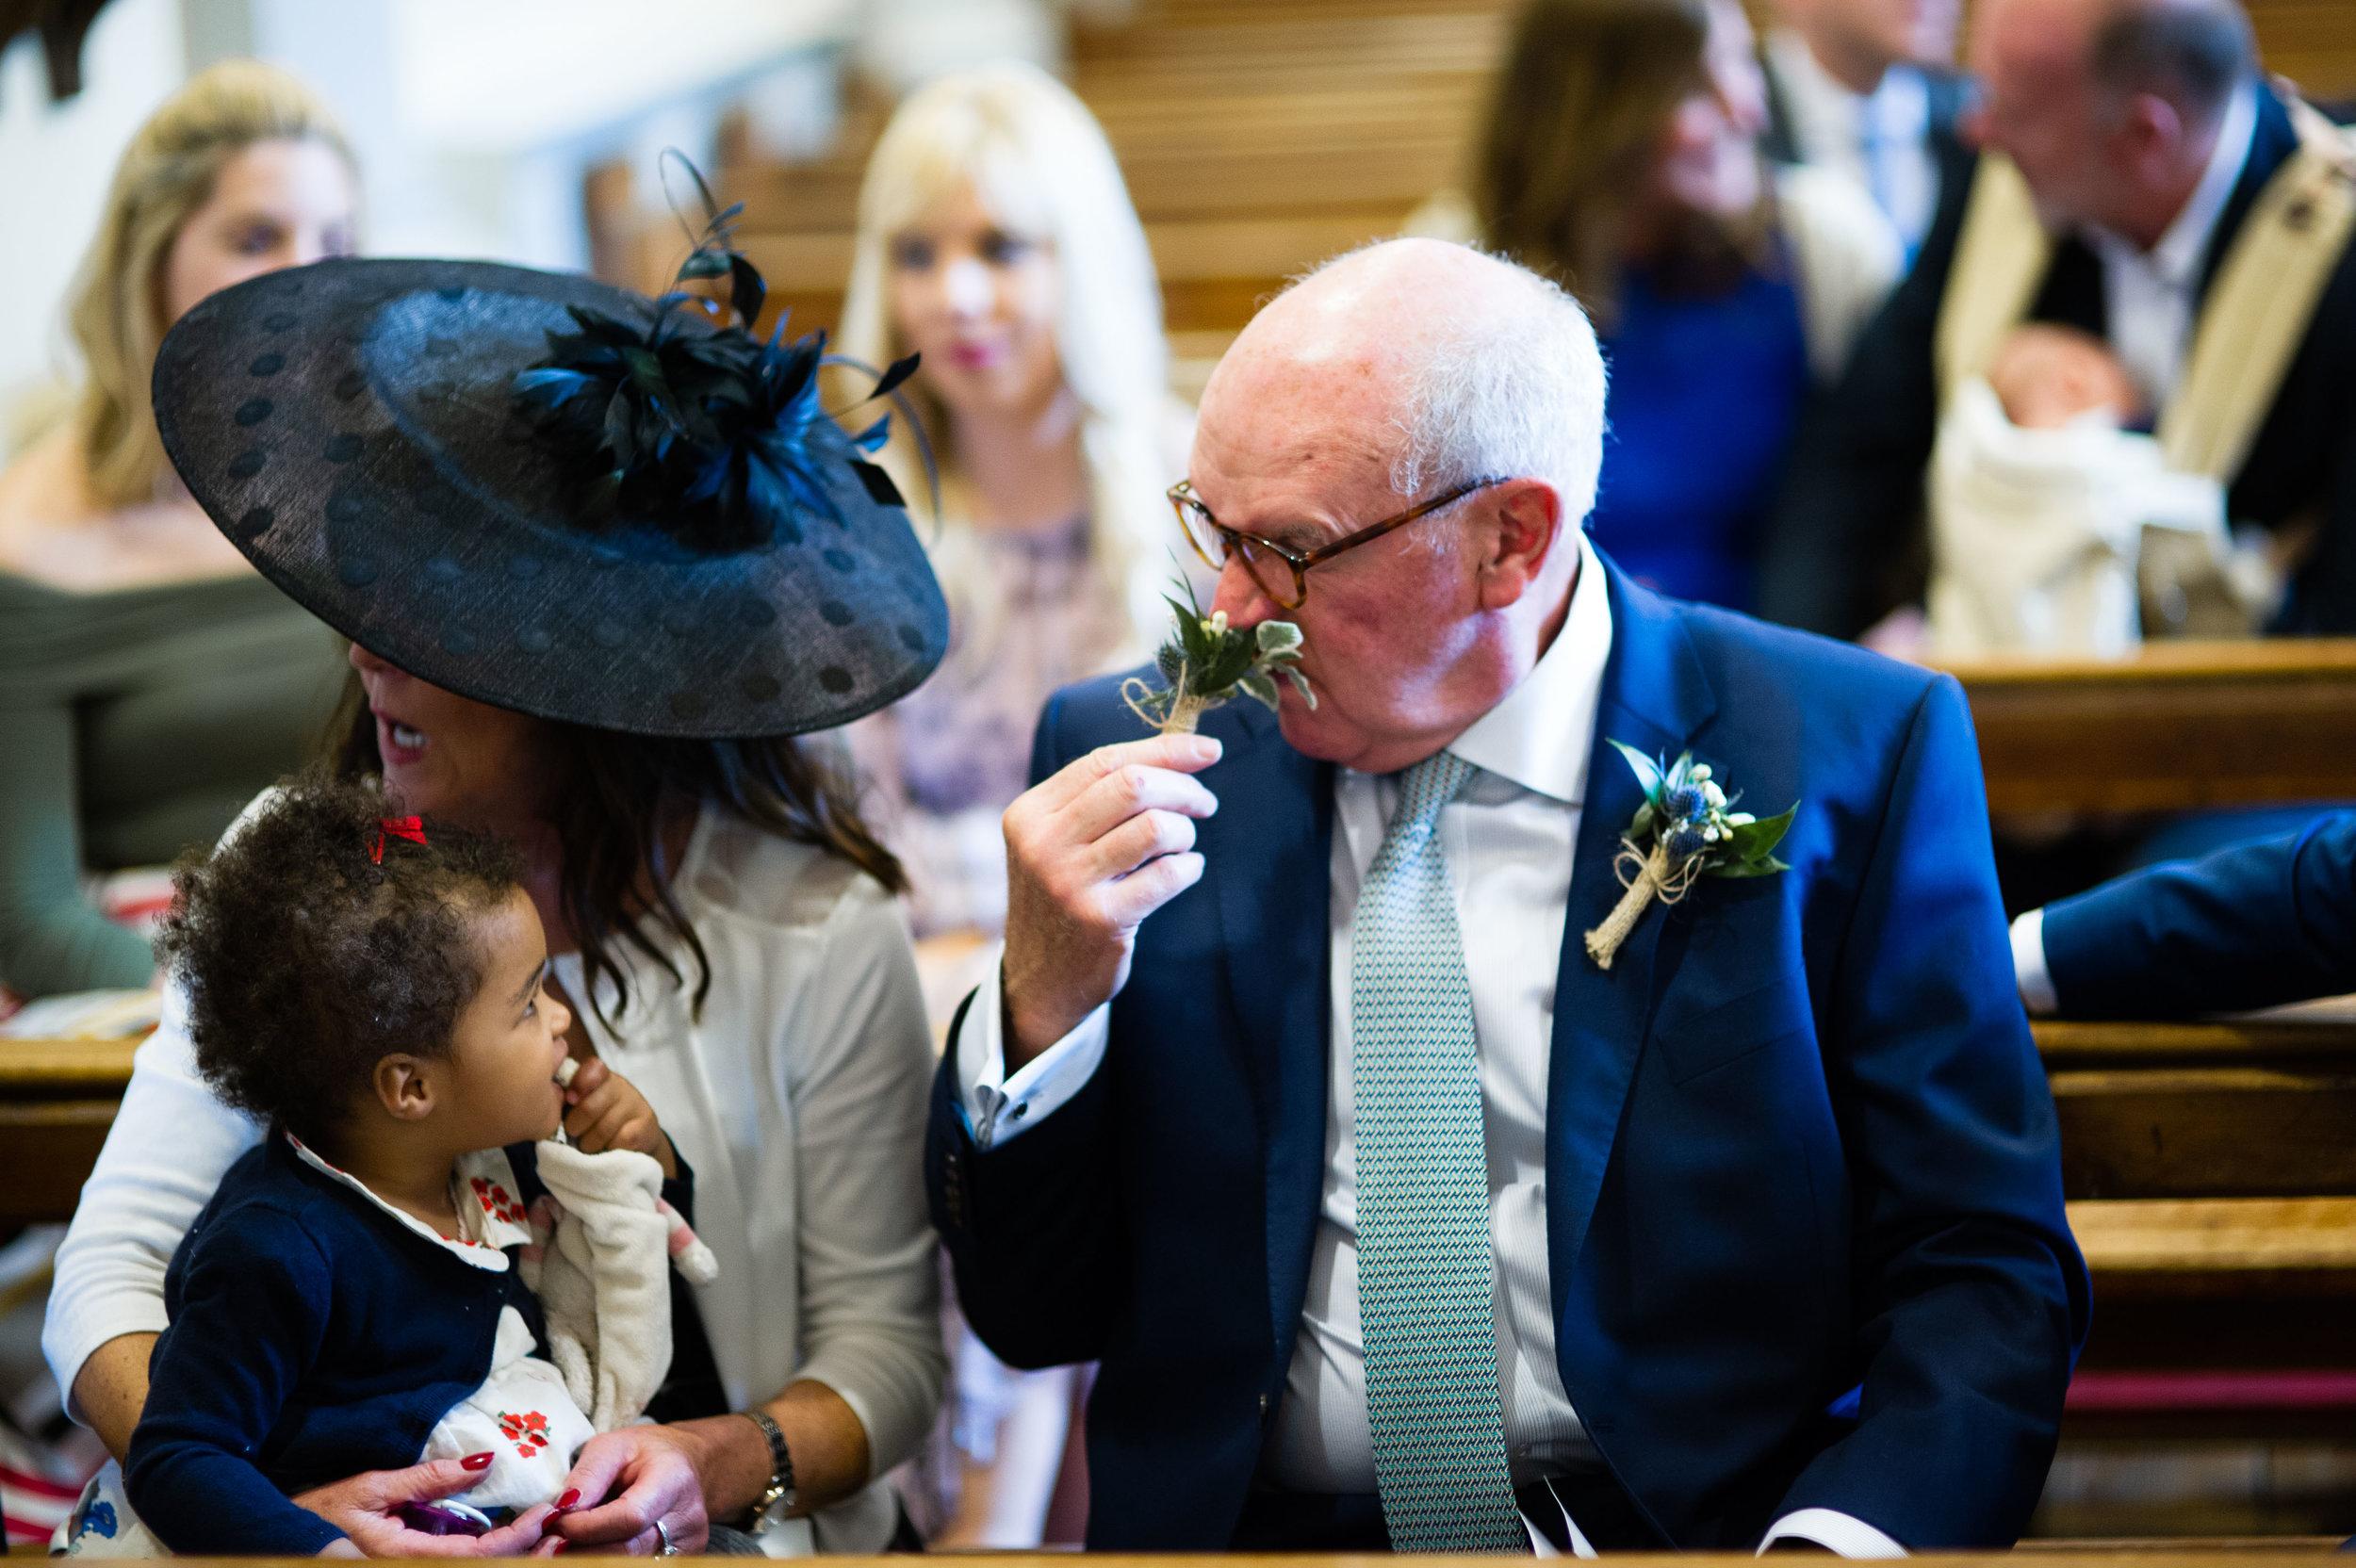 Beechfield house weddings - Abby and Greg (58 of 208).jpg